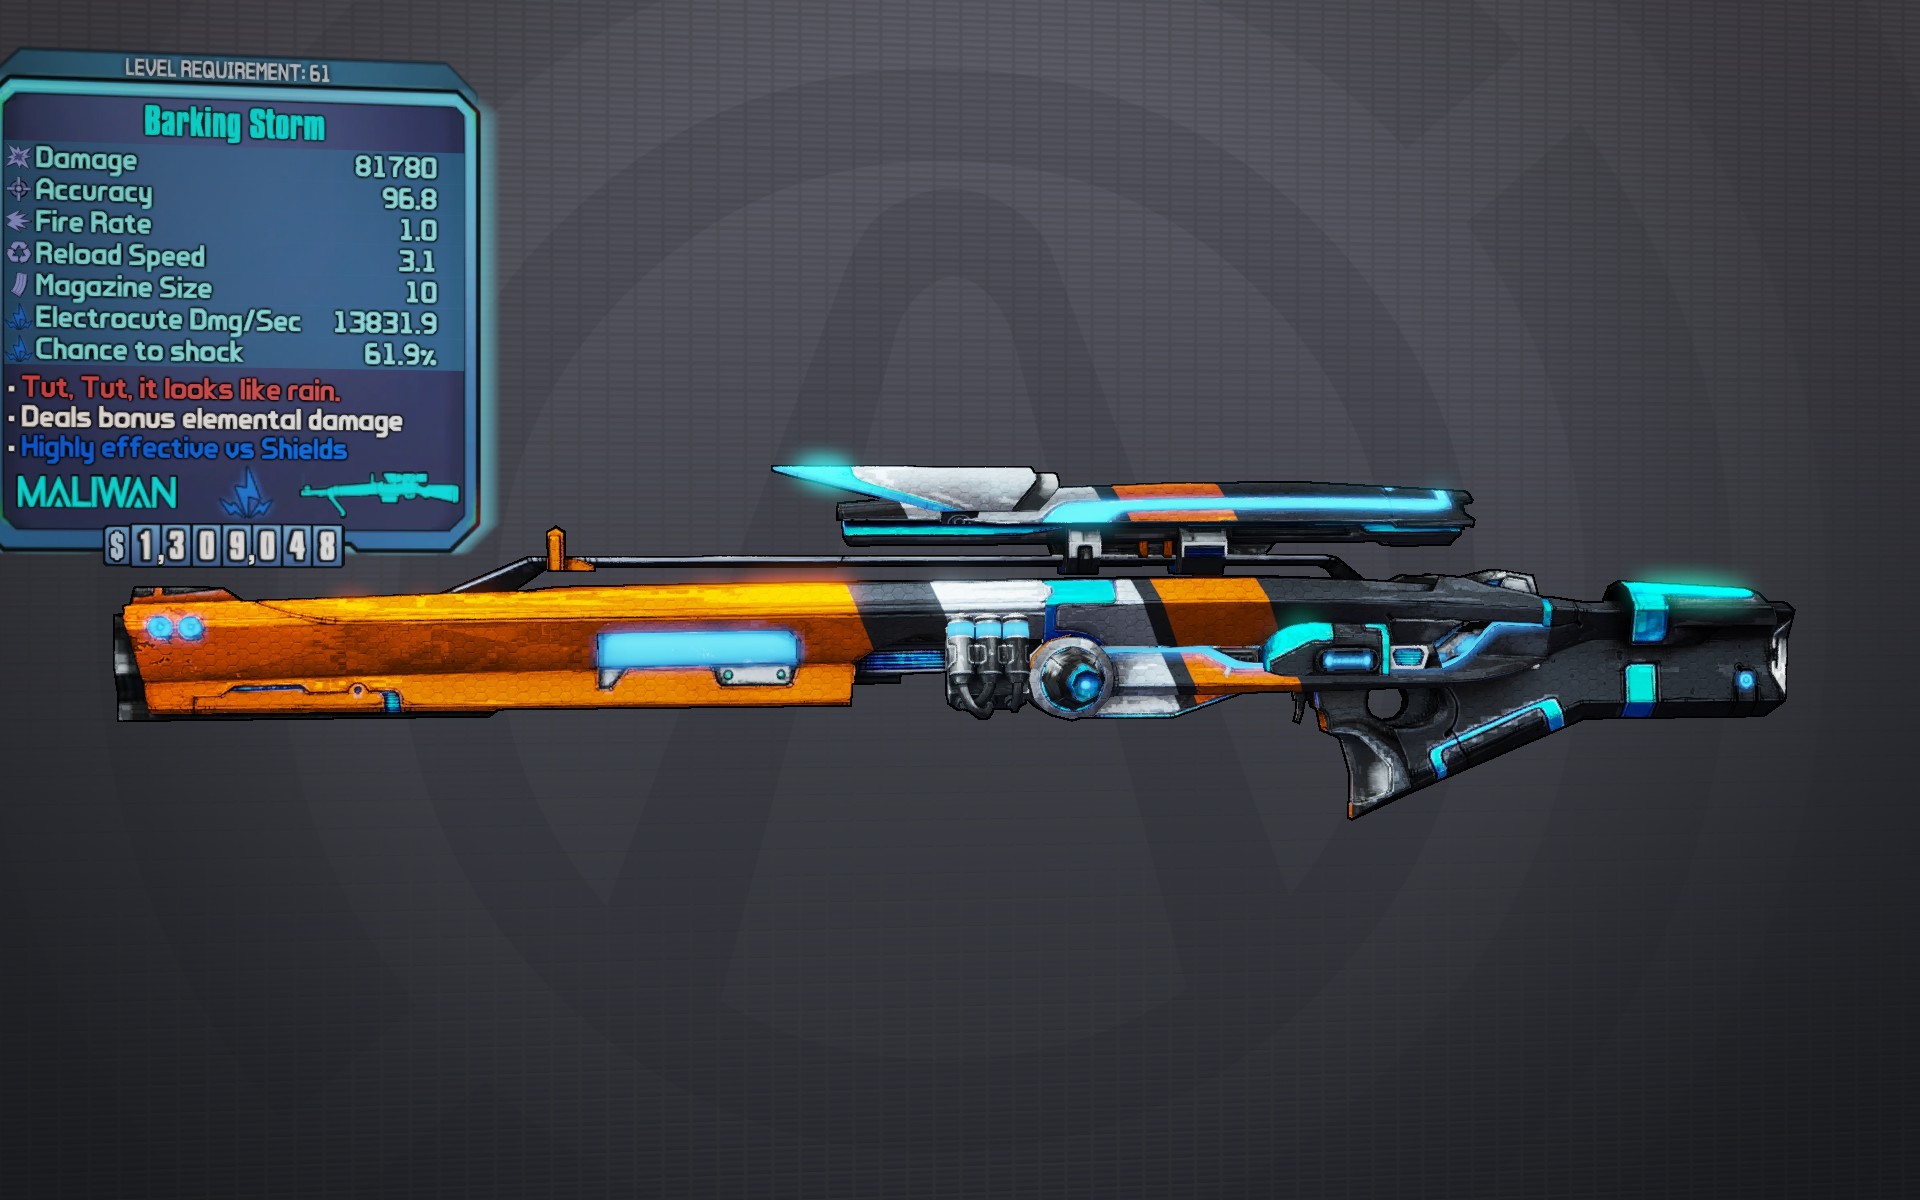 Storm (sniper rifle)